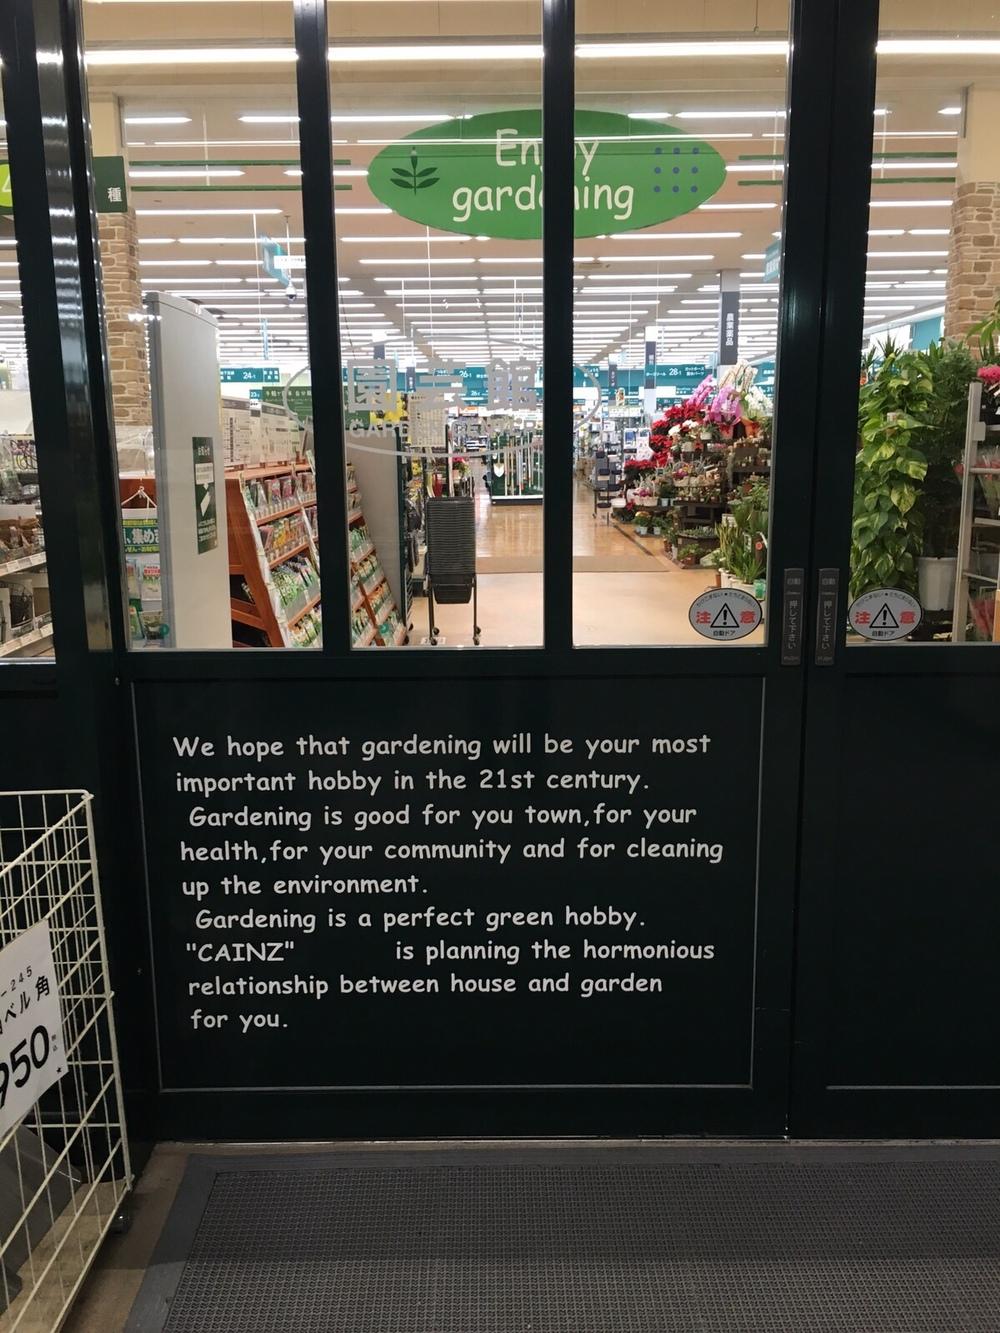 Japan's version of Home Depot